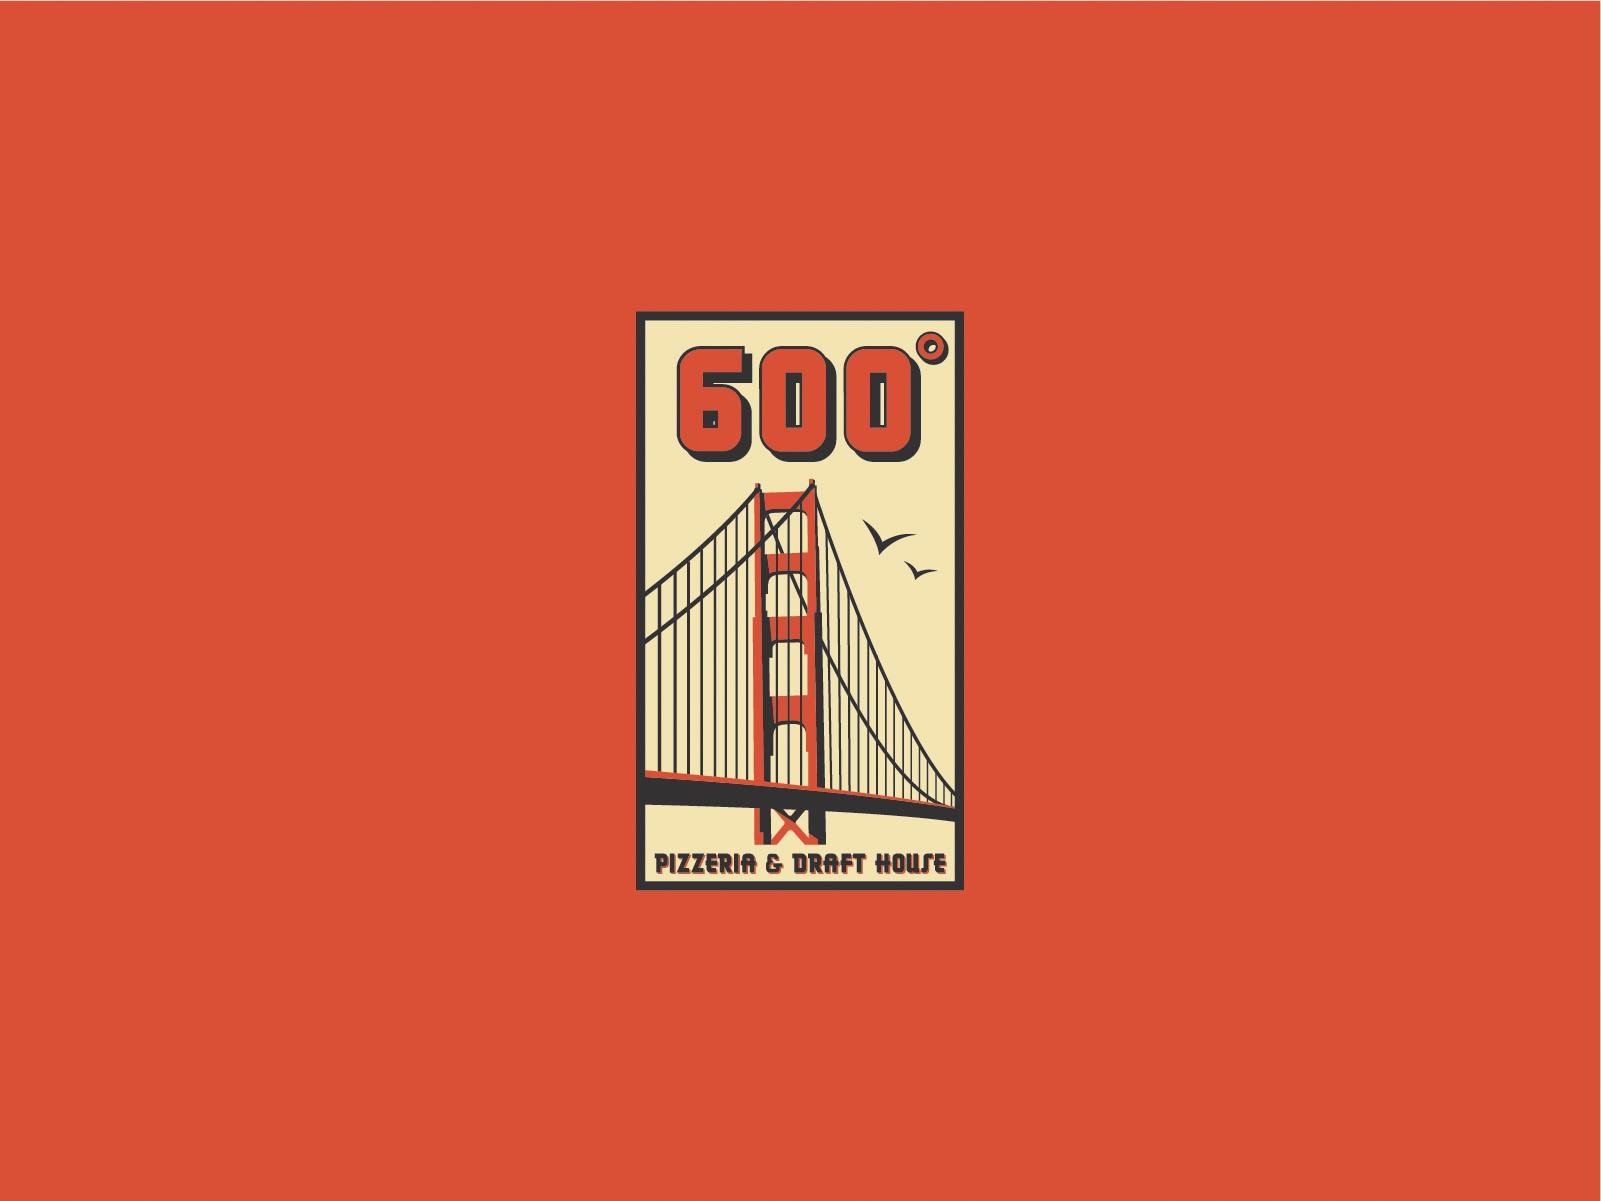 600 degrees logo redesign